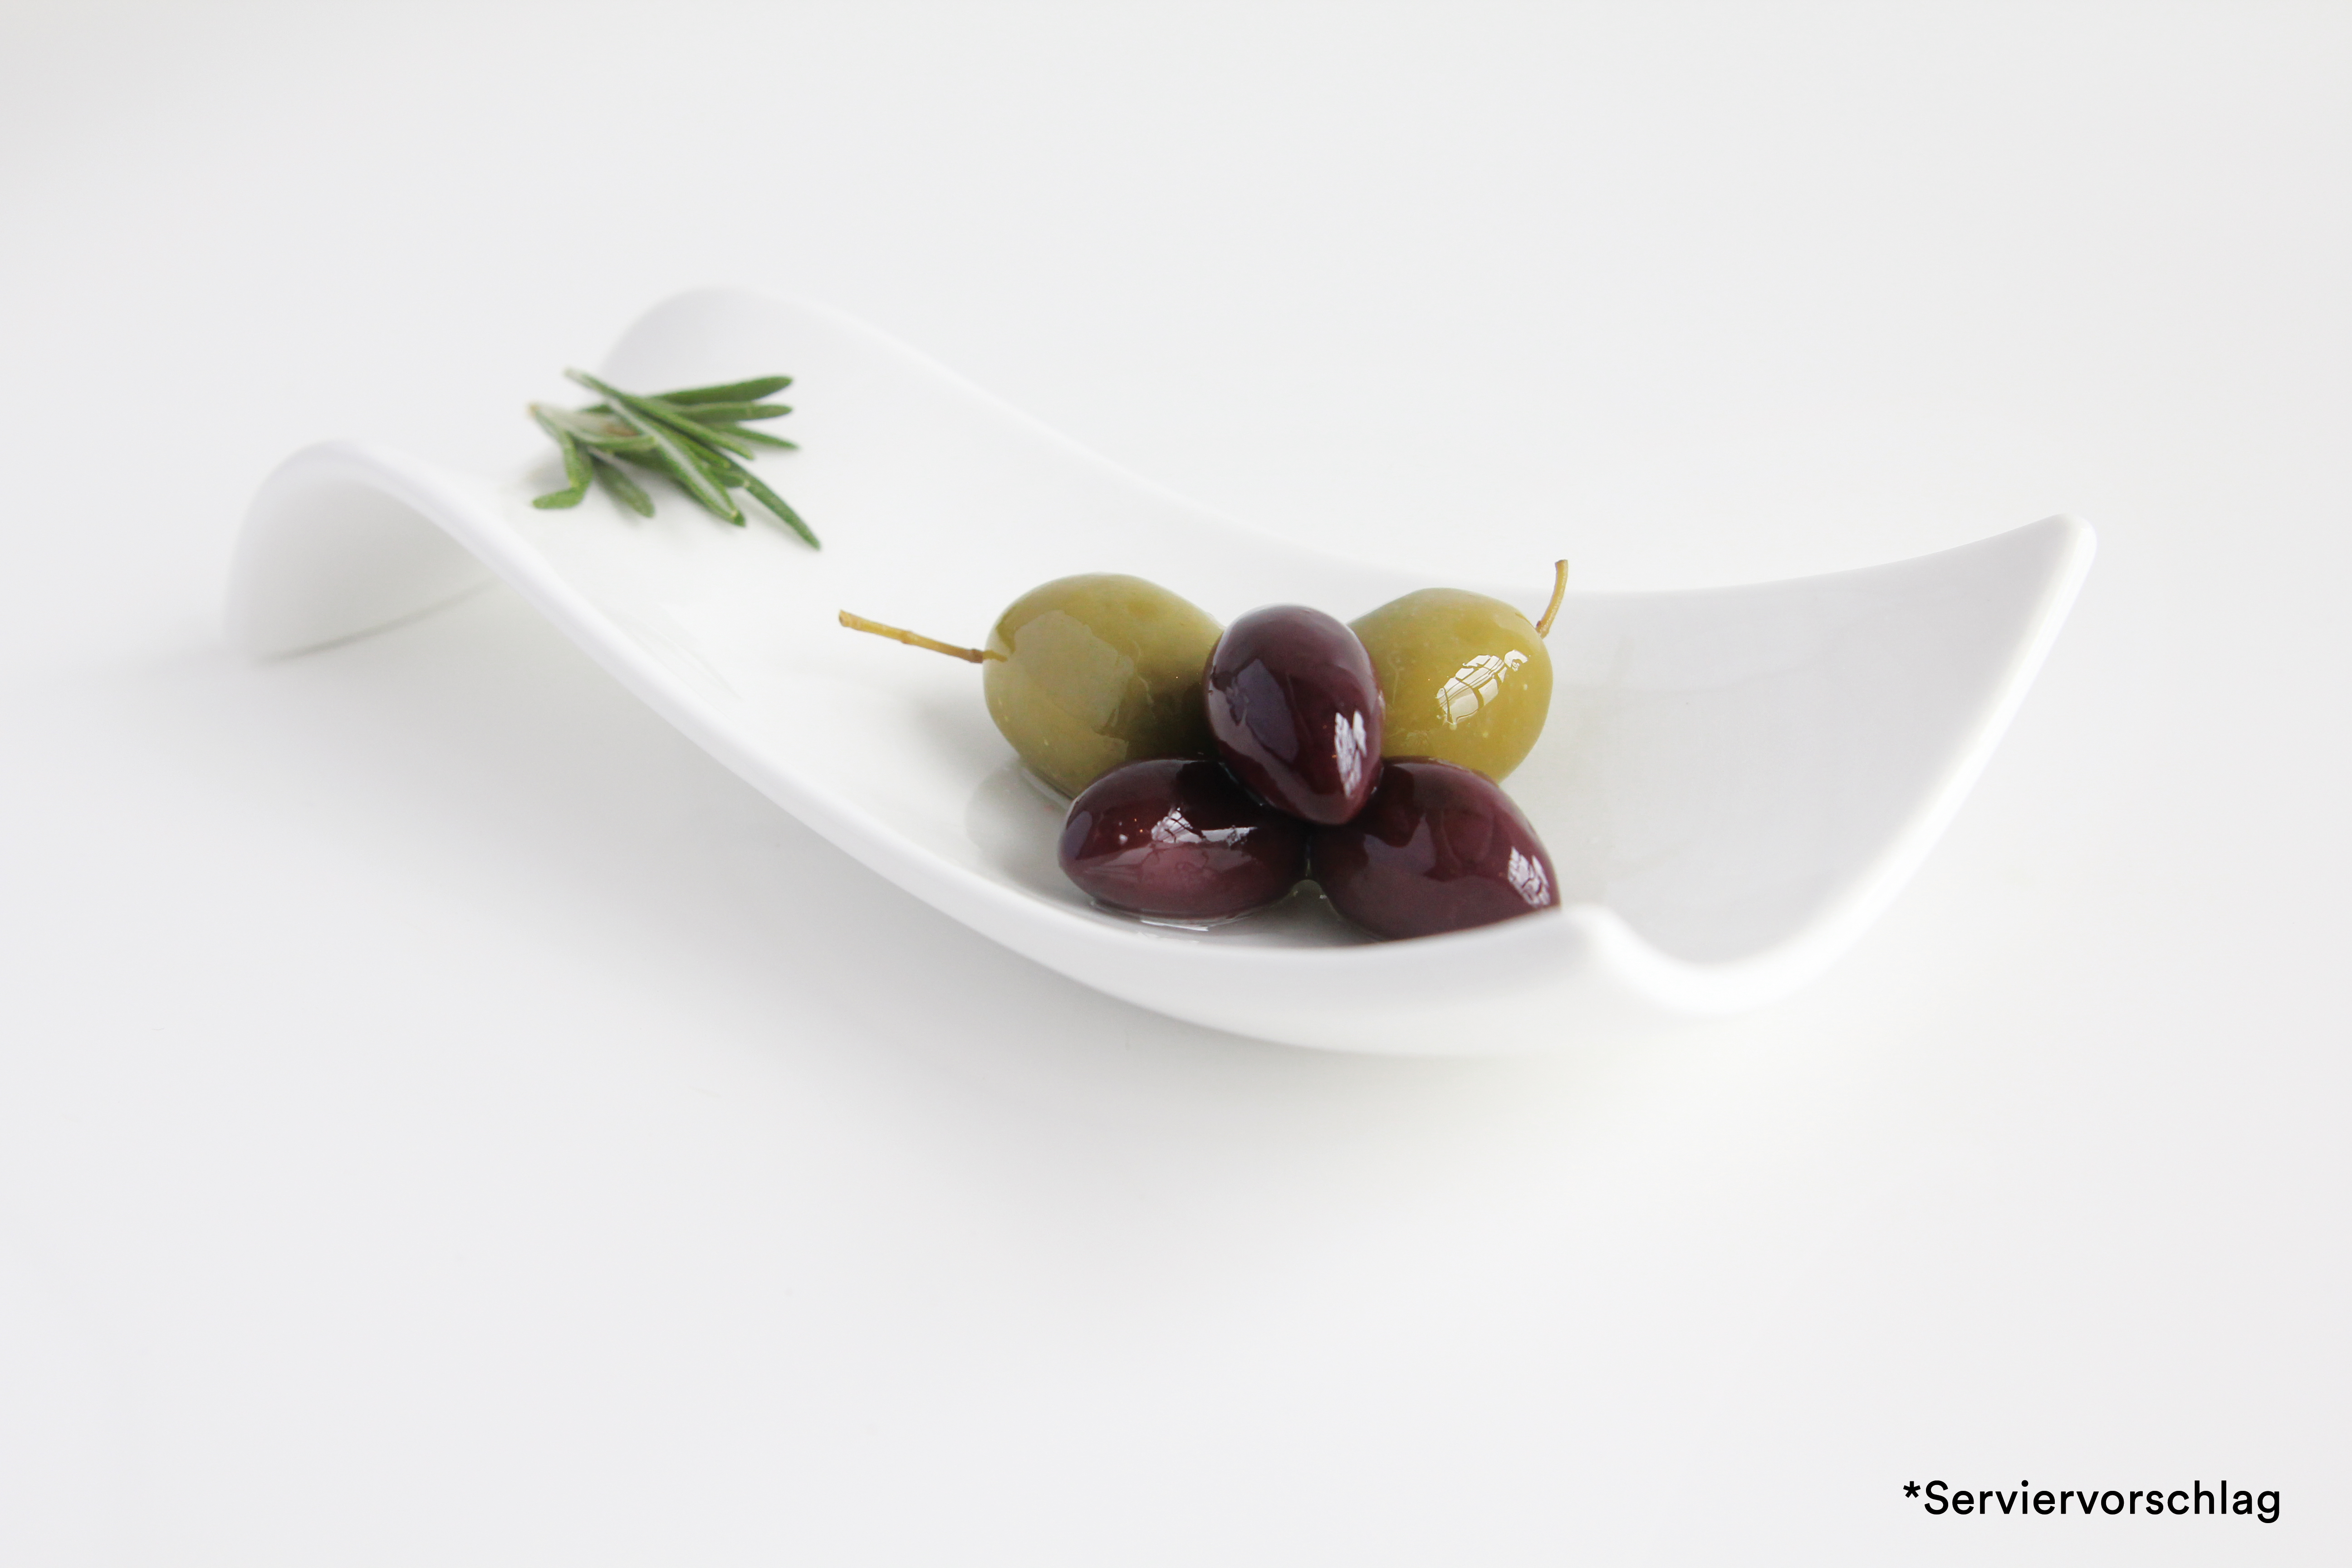 Gourmet Mammouth-Oliven, ohne Stein